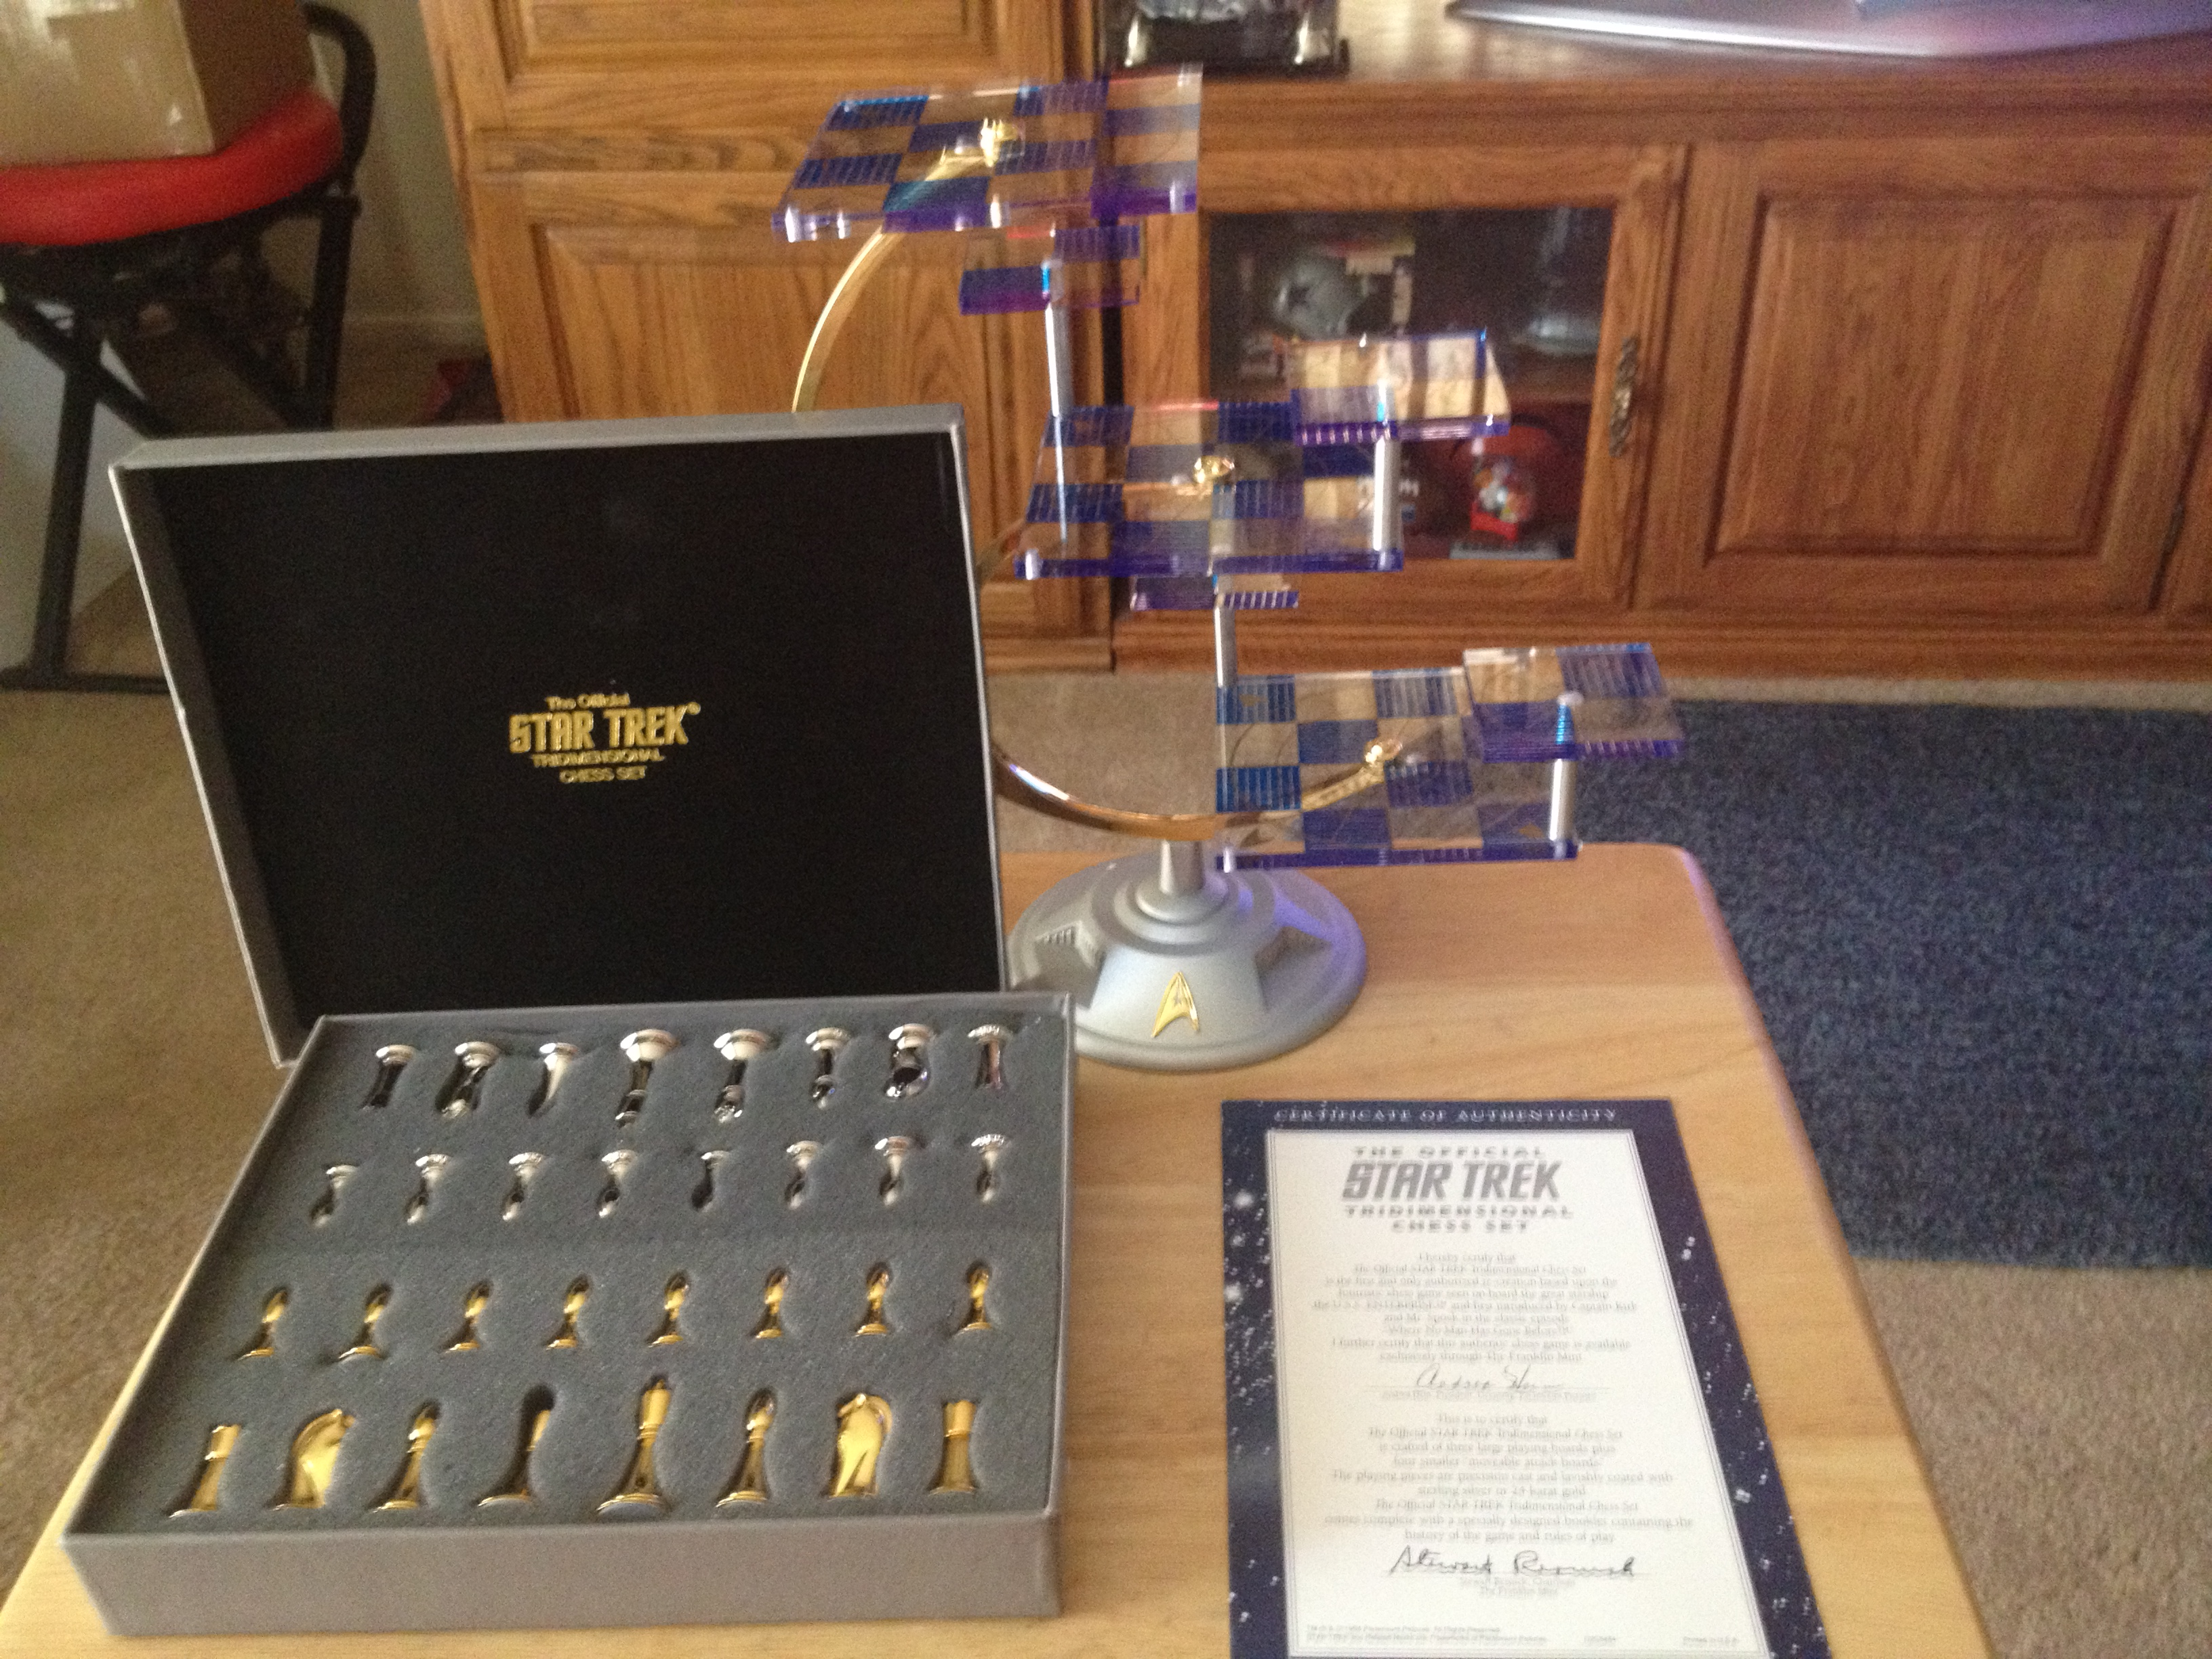 Star Trek Tri Dimensional Chess Set By The Franklin Mint